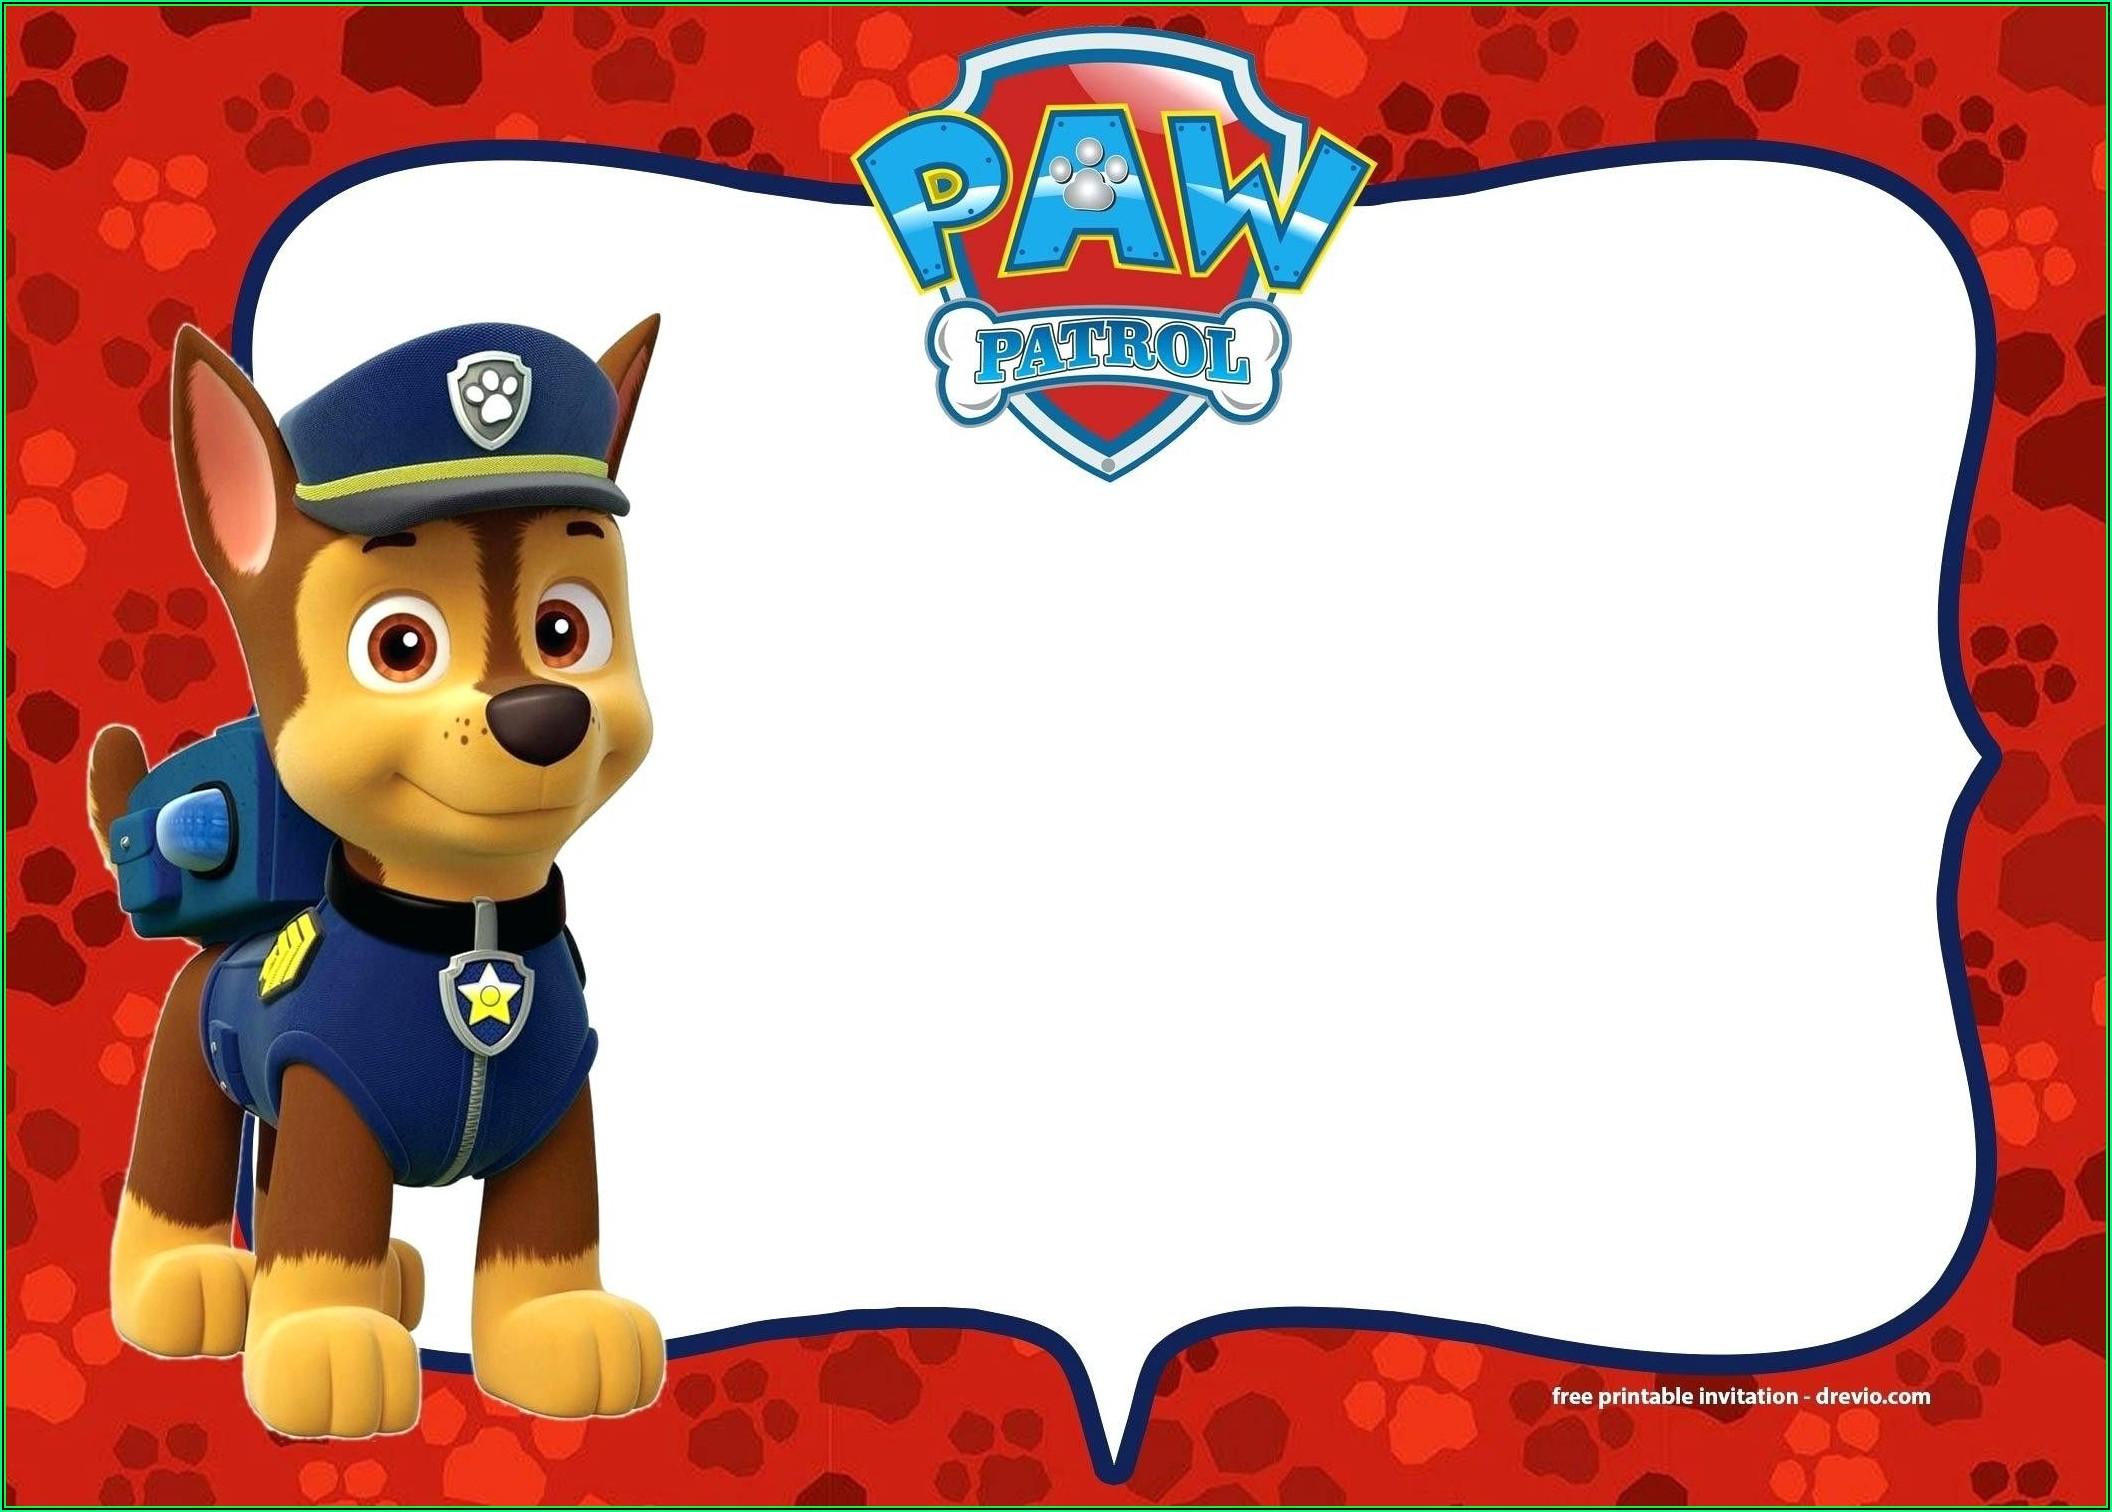 Paw Patrol Birthday Party Invitation Template Free